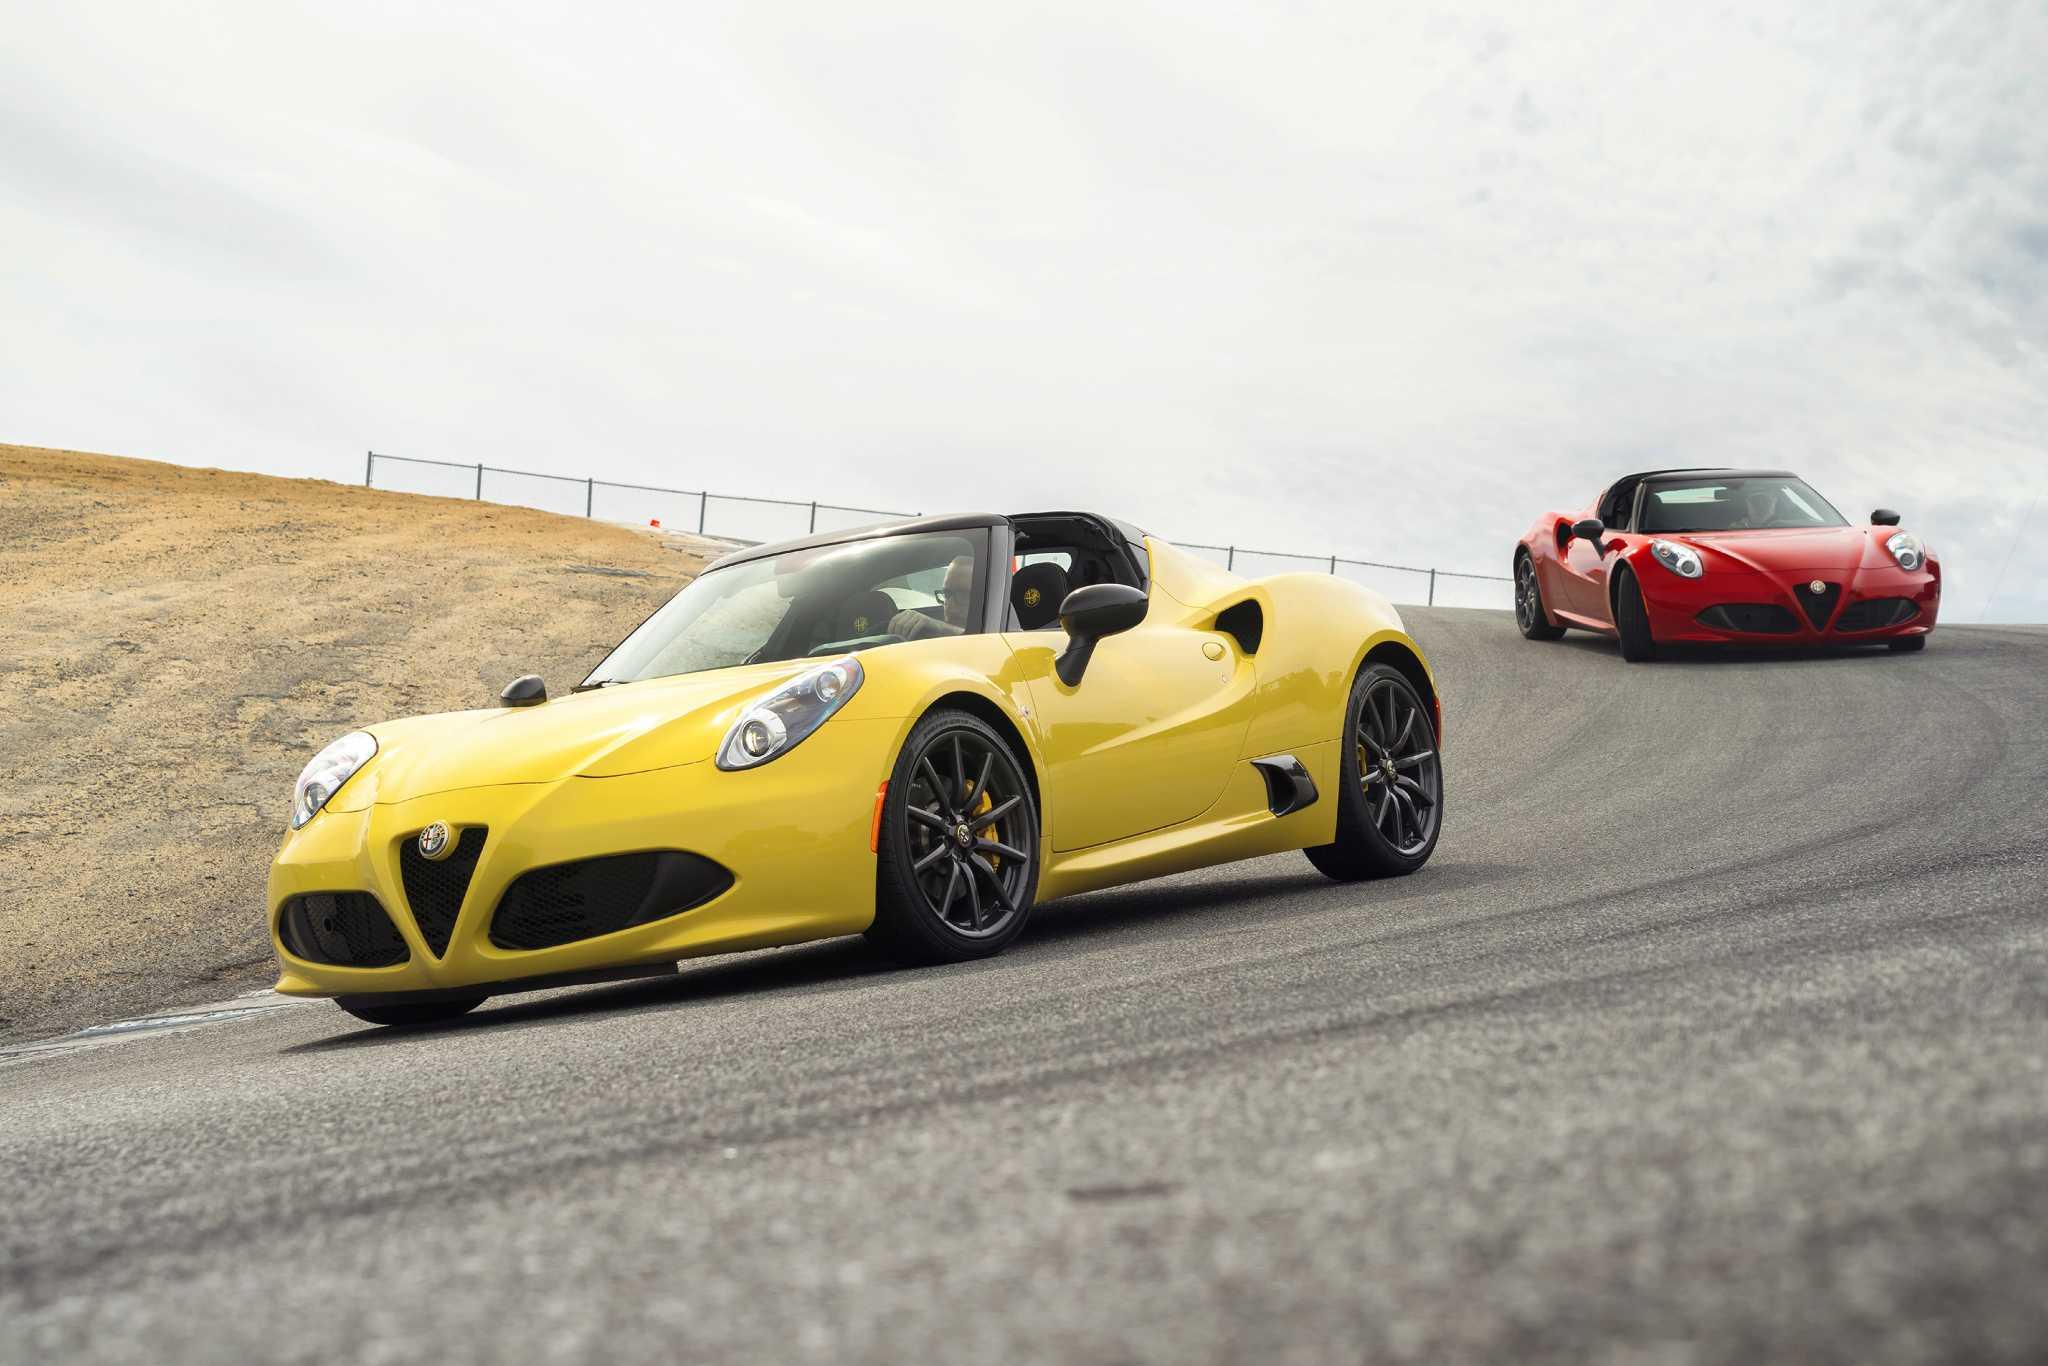 Along came a Spider - Alfa Romeo 4C drop-top coming to U.S.